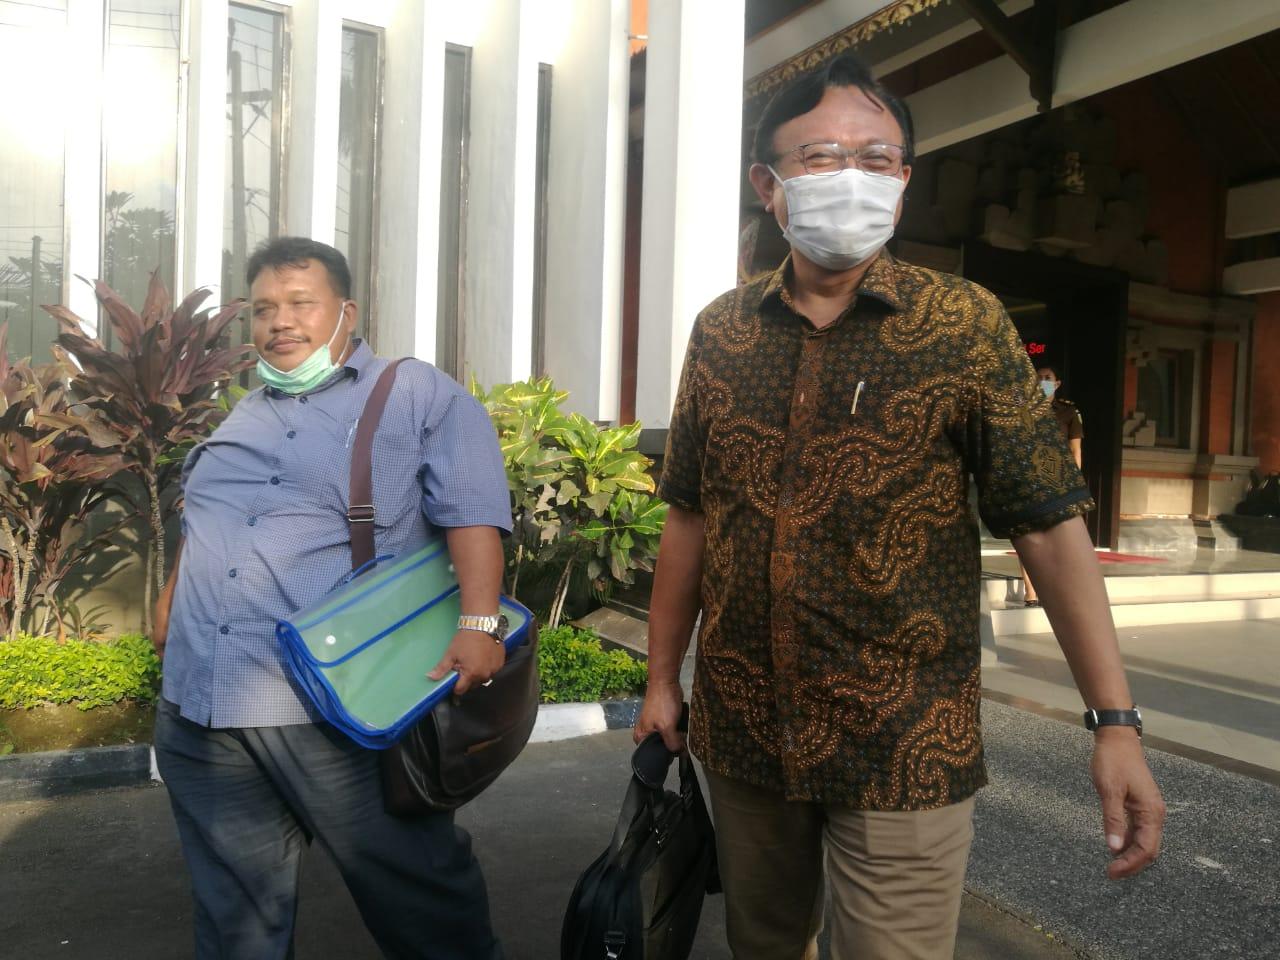 Mantan Sekda Buleleng, Dewa Ketut Puspaka didampingi kuasa hukumnya Agus Sujoko keluar dari Kejati Bali usai jalani pemeriksaan sebagai saksi, Selasa (24/03/2021). Foto: Lintasnusanews.com/Agung Widodo